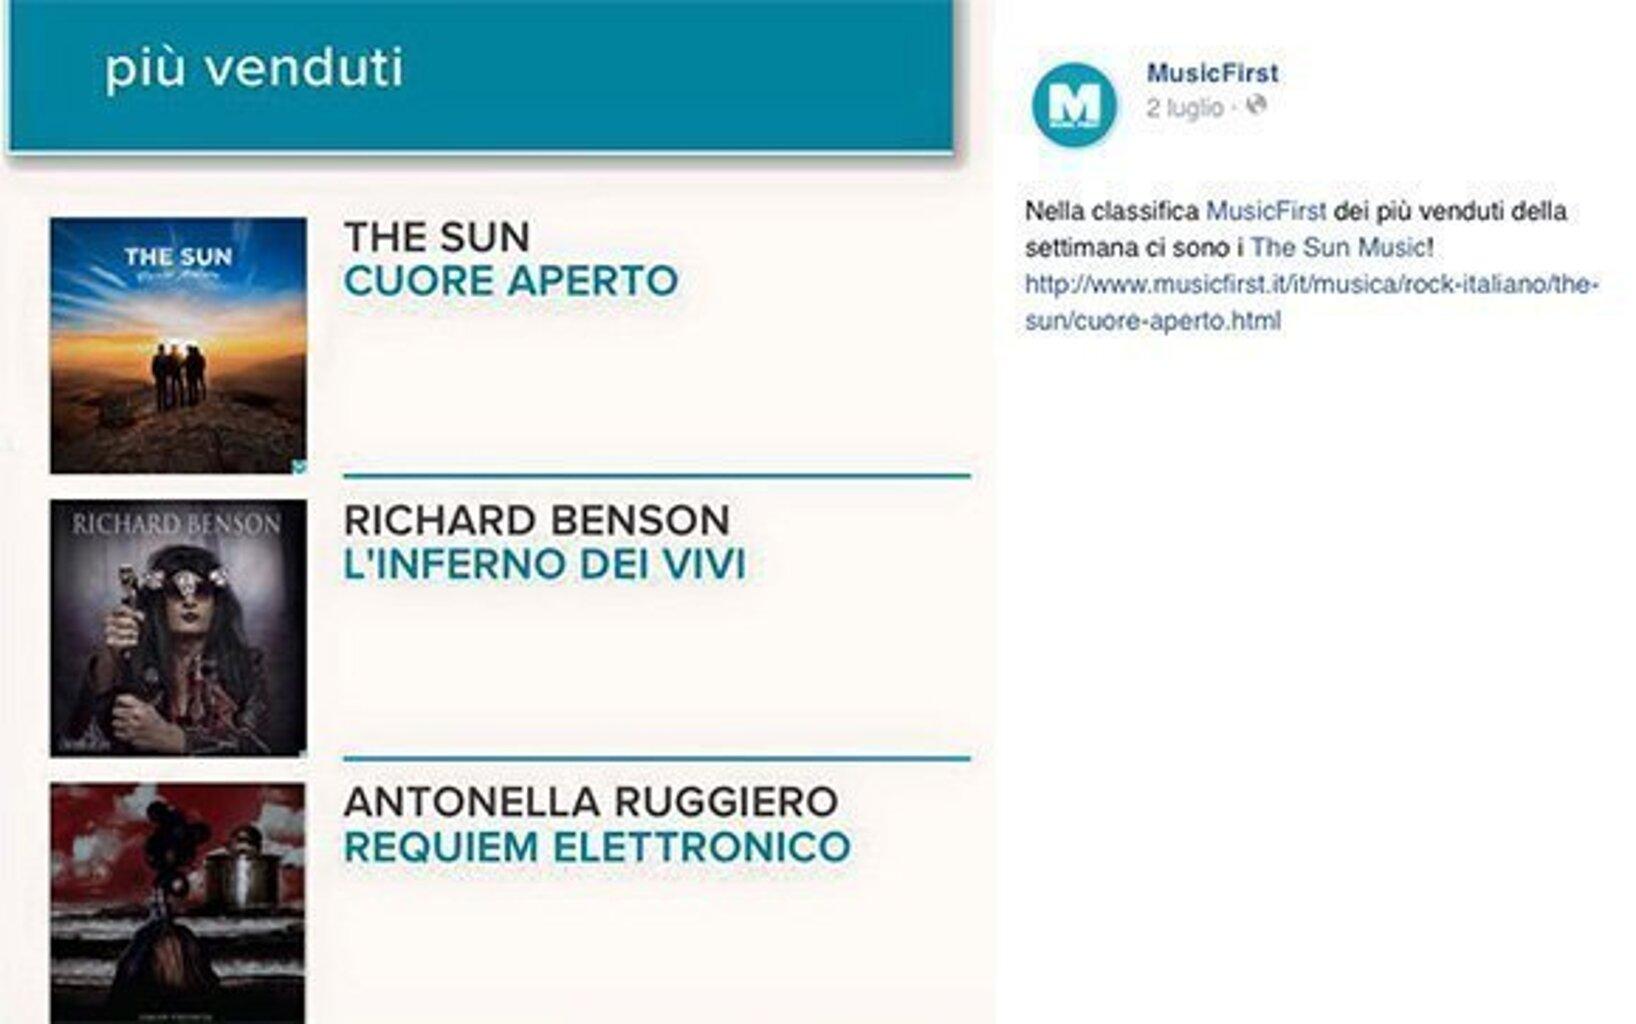 The Sun classifica Music First